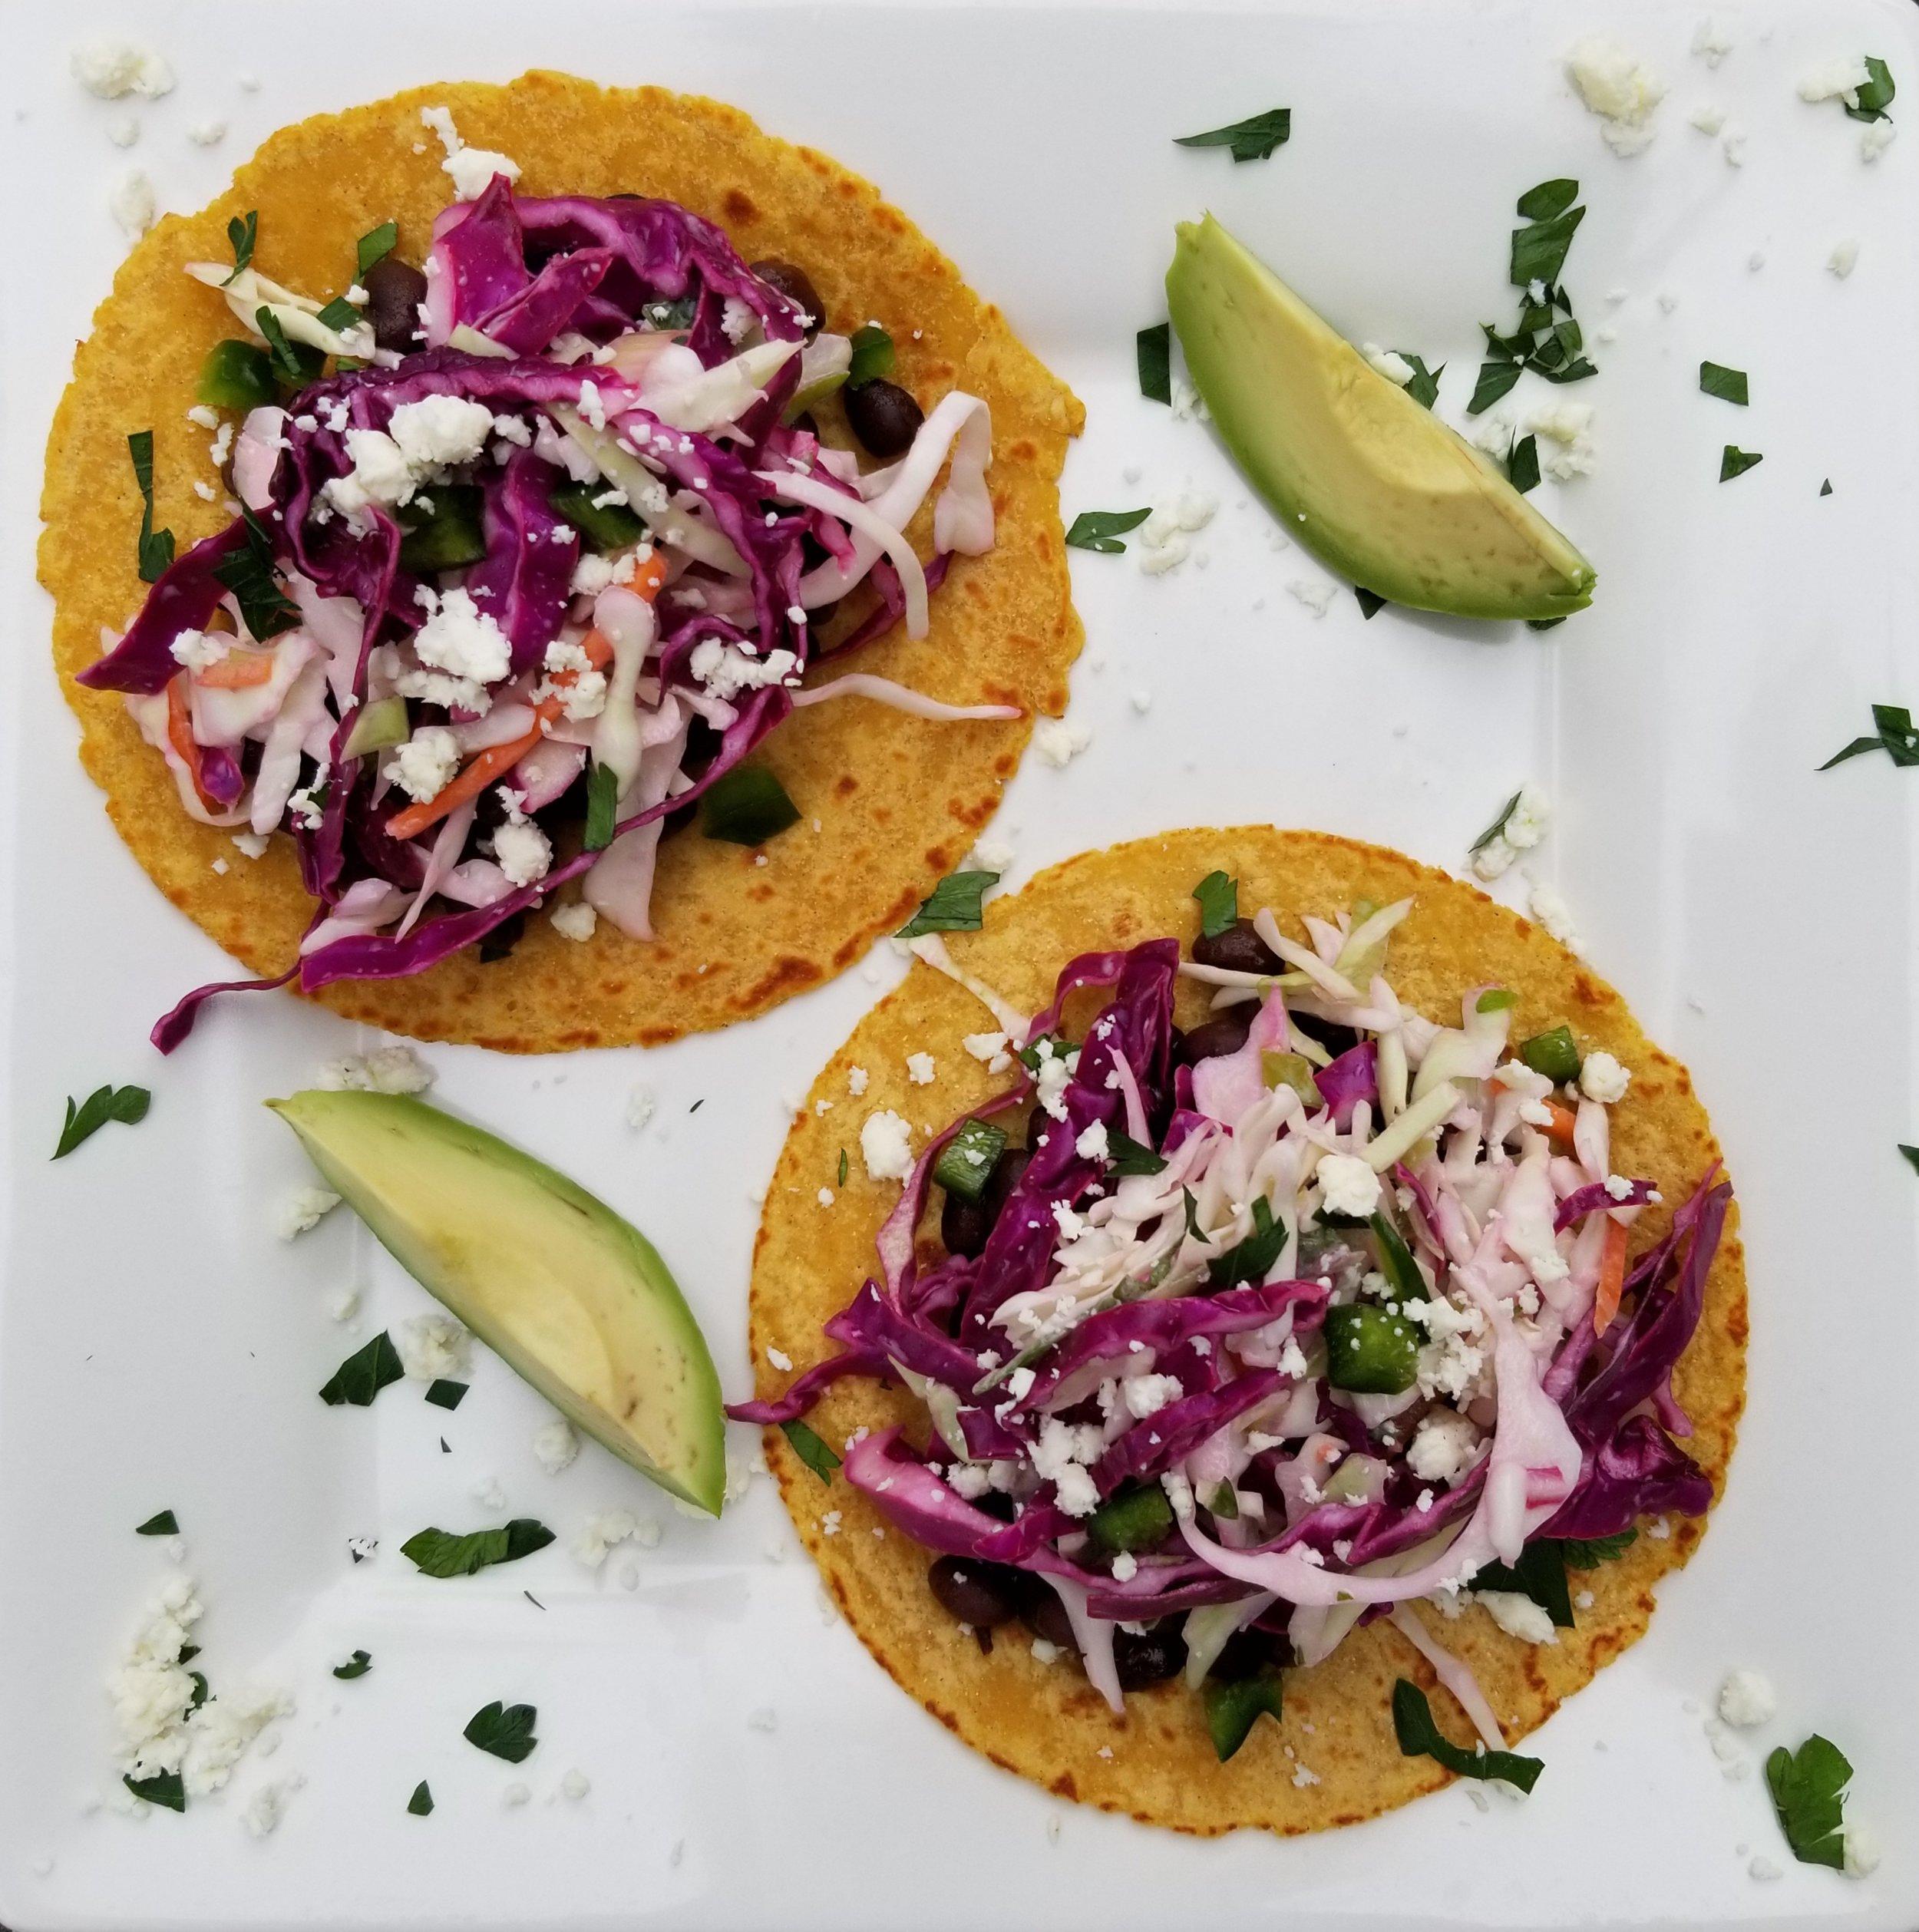 Month In Review April 2018 - Minimalist Kitchen Black Bean Tacos.jpg